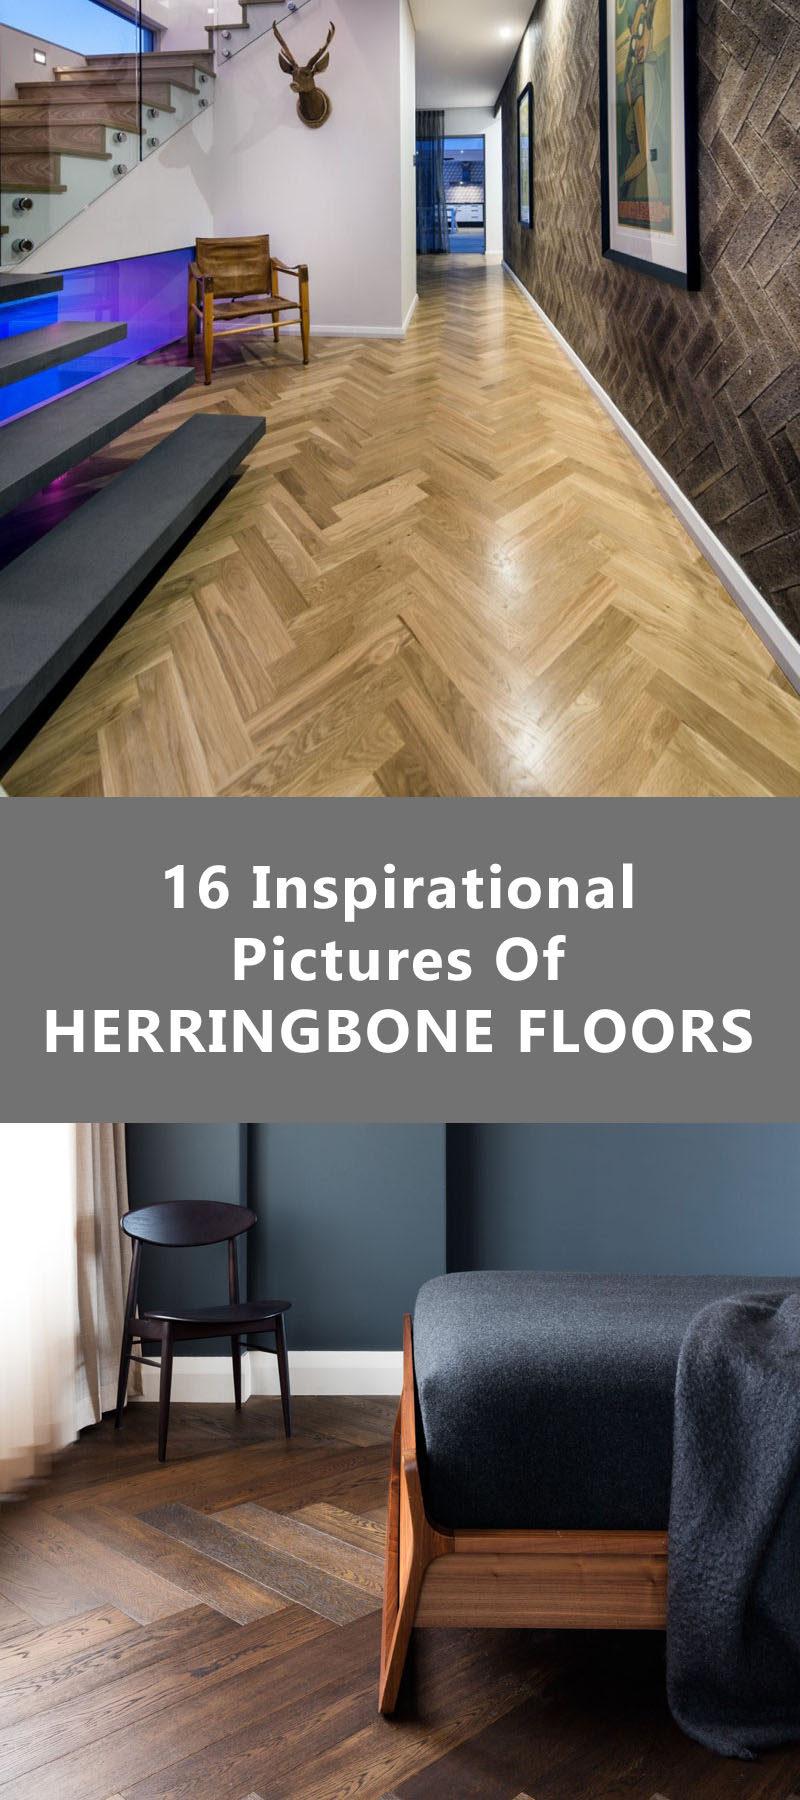 16 Inspirational Pictures Of Herringbone Floors